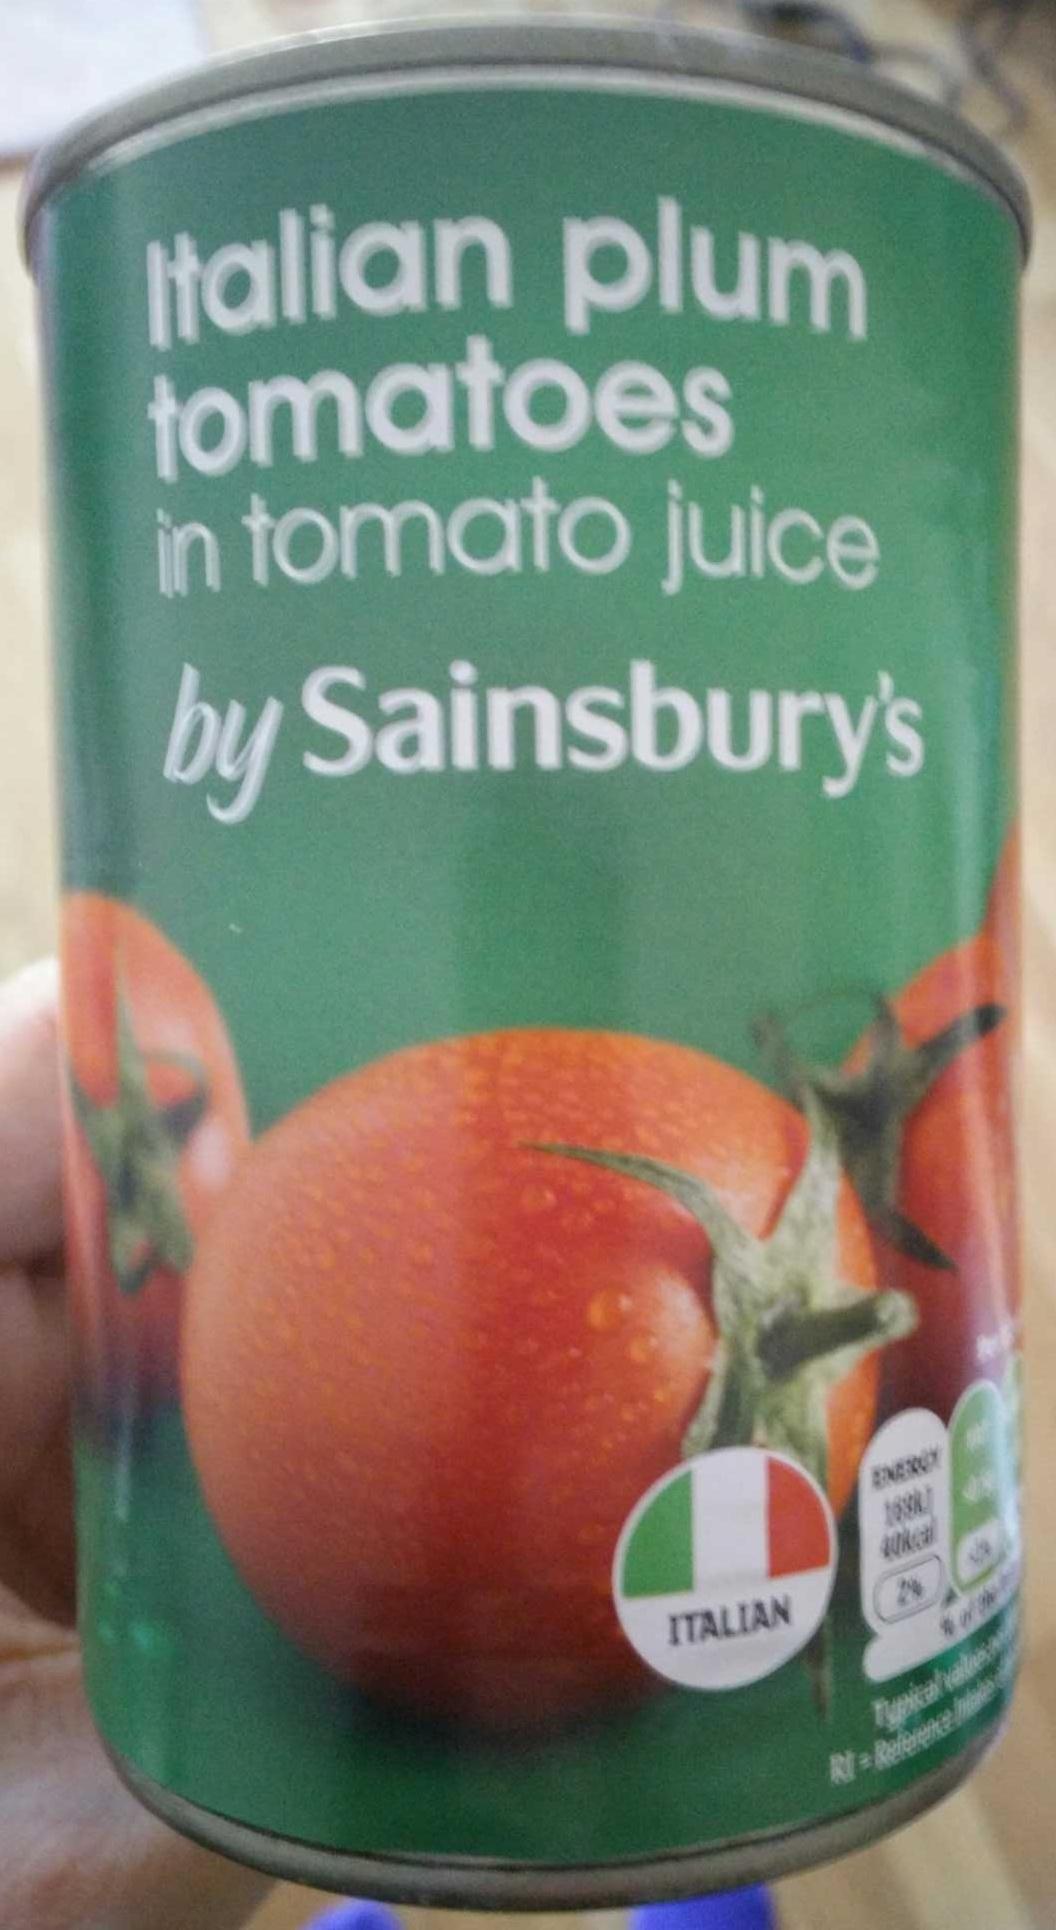 Italian plum tomatoes in tomato juice - Product